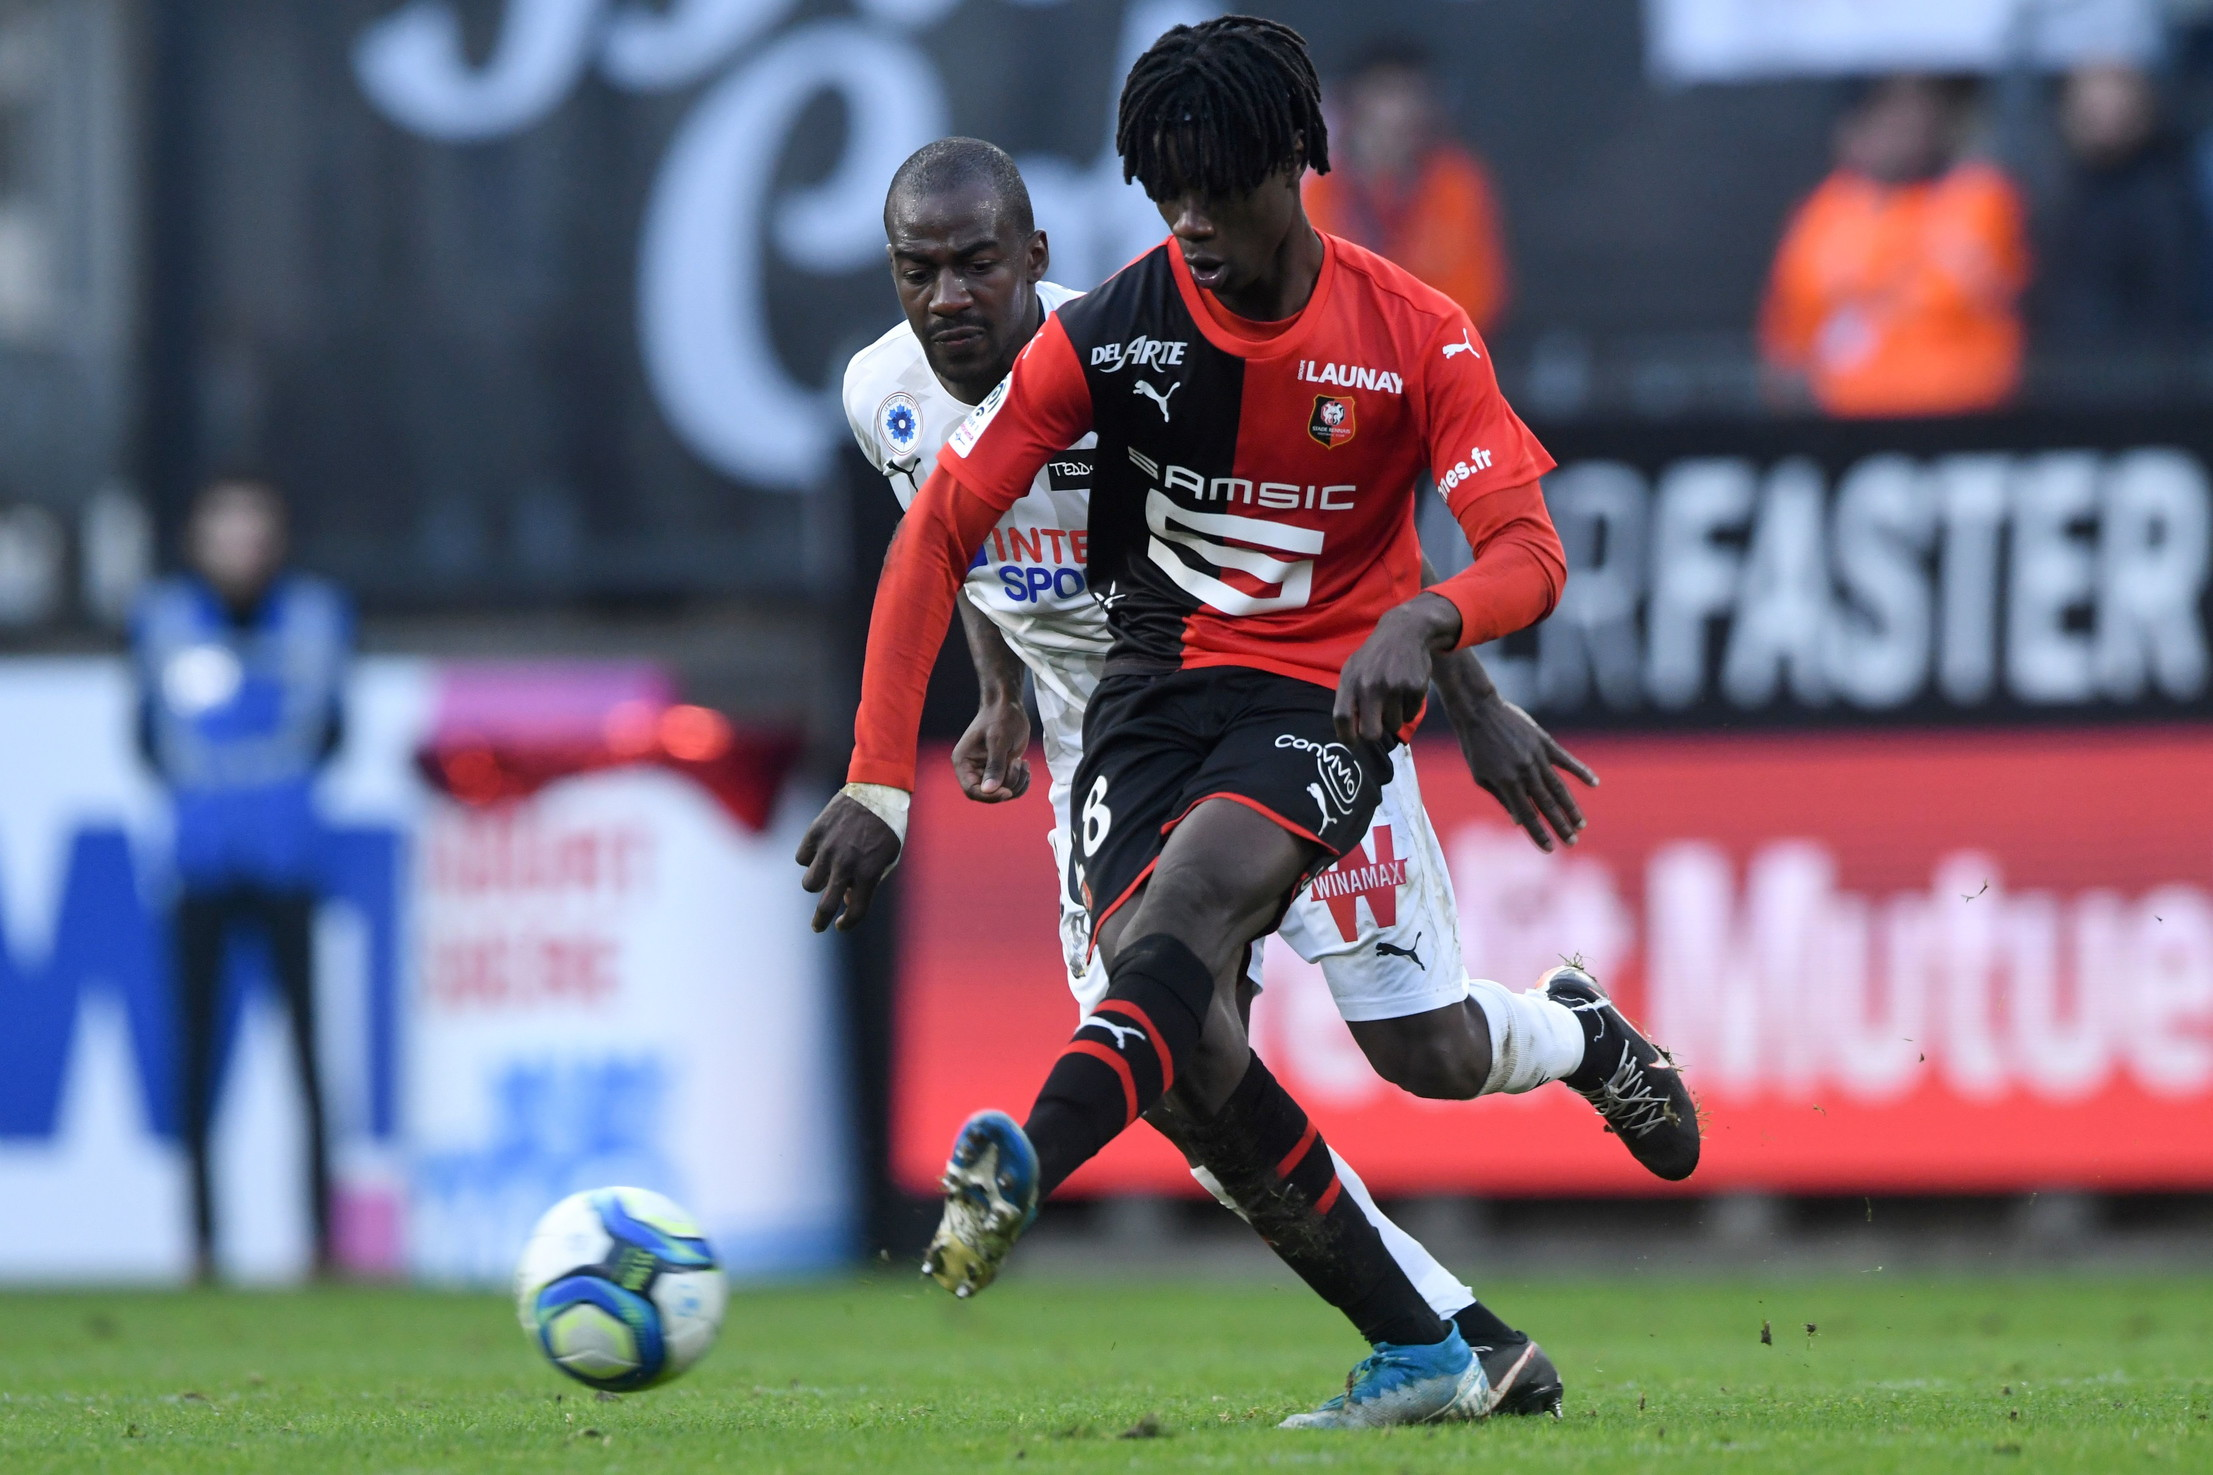 Eduardo Camavinga (Rennes): 47,6 milioni